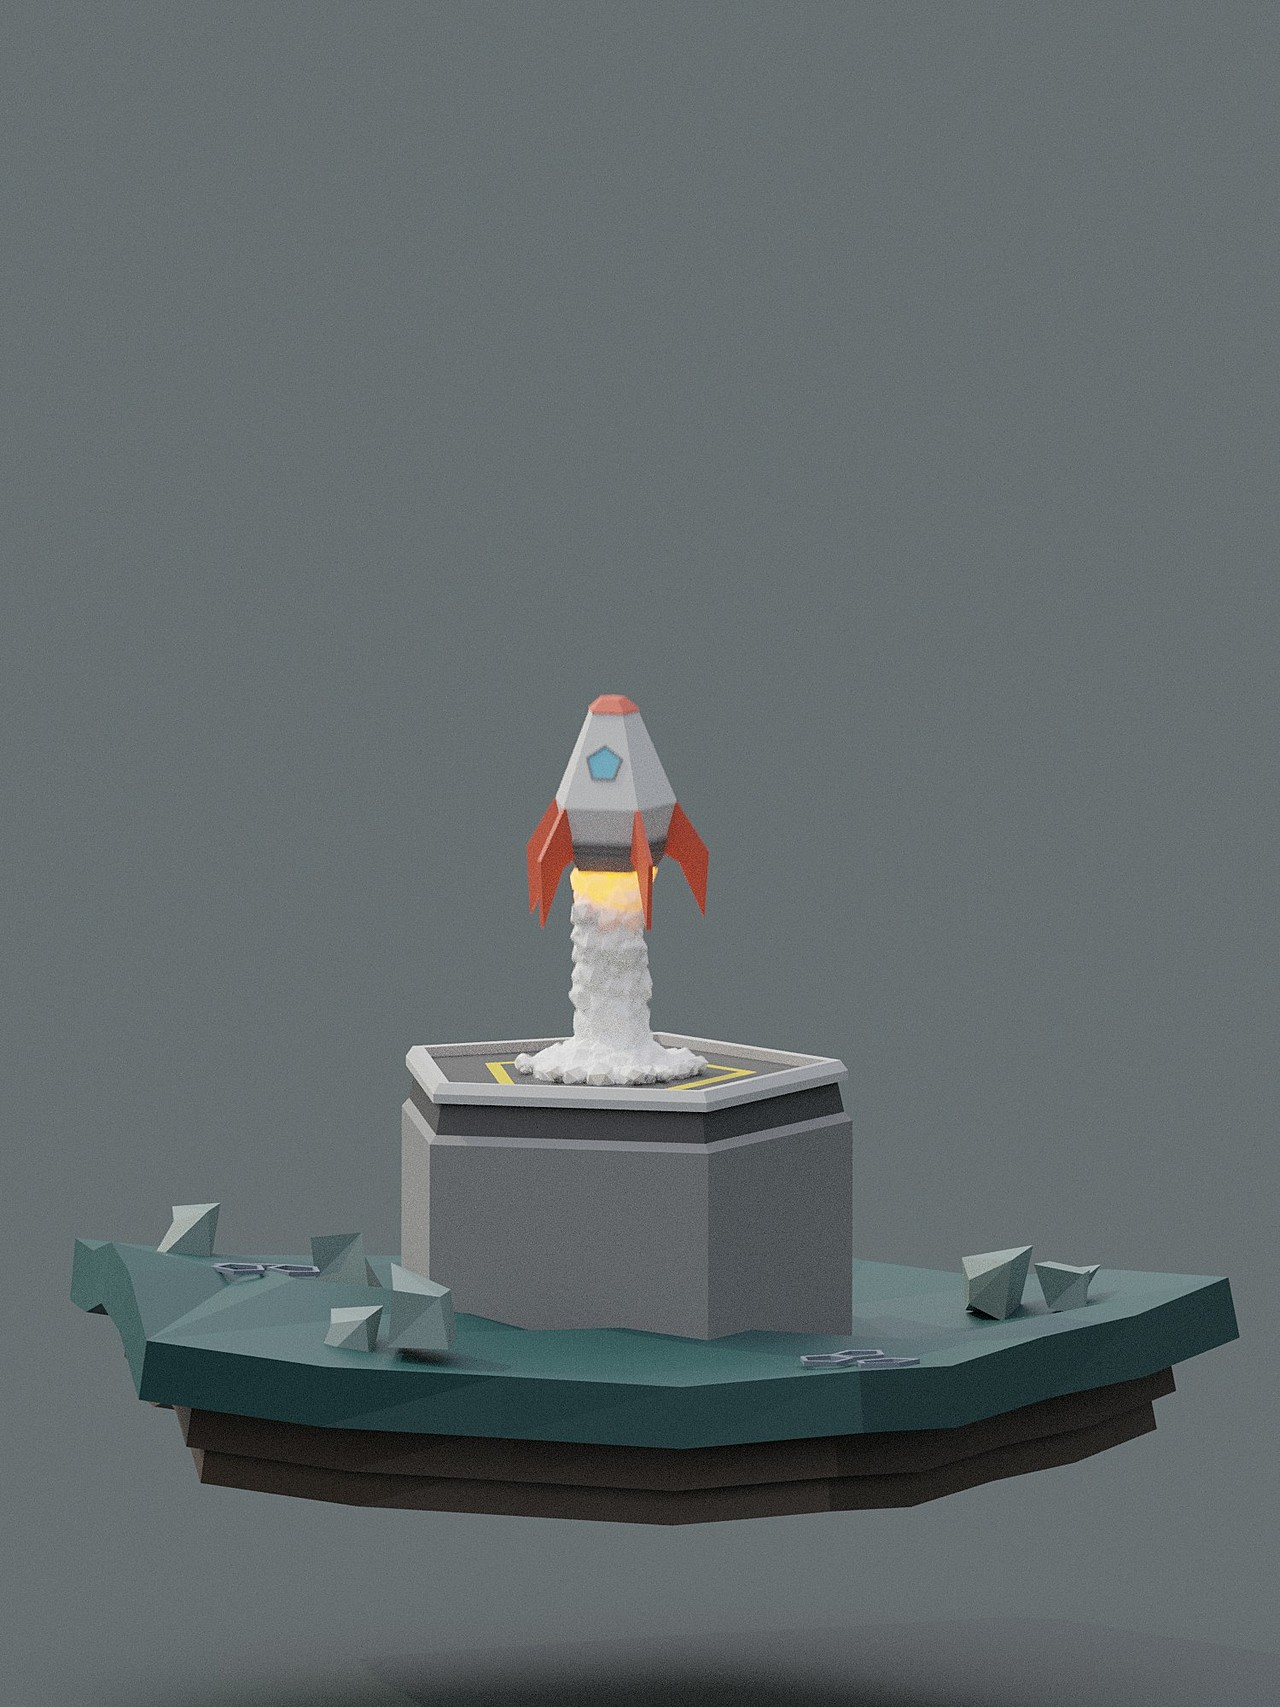 Low Poly Rocket (1st Render)